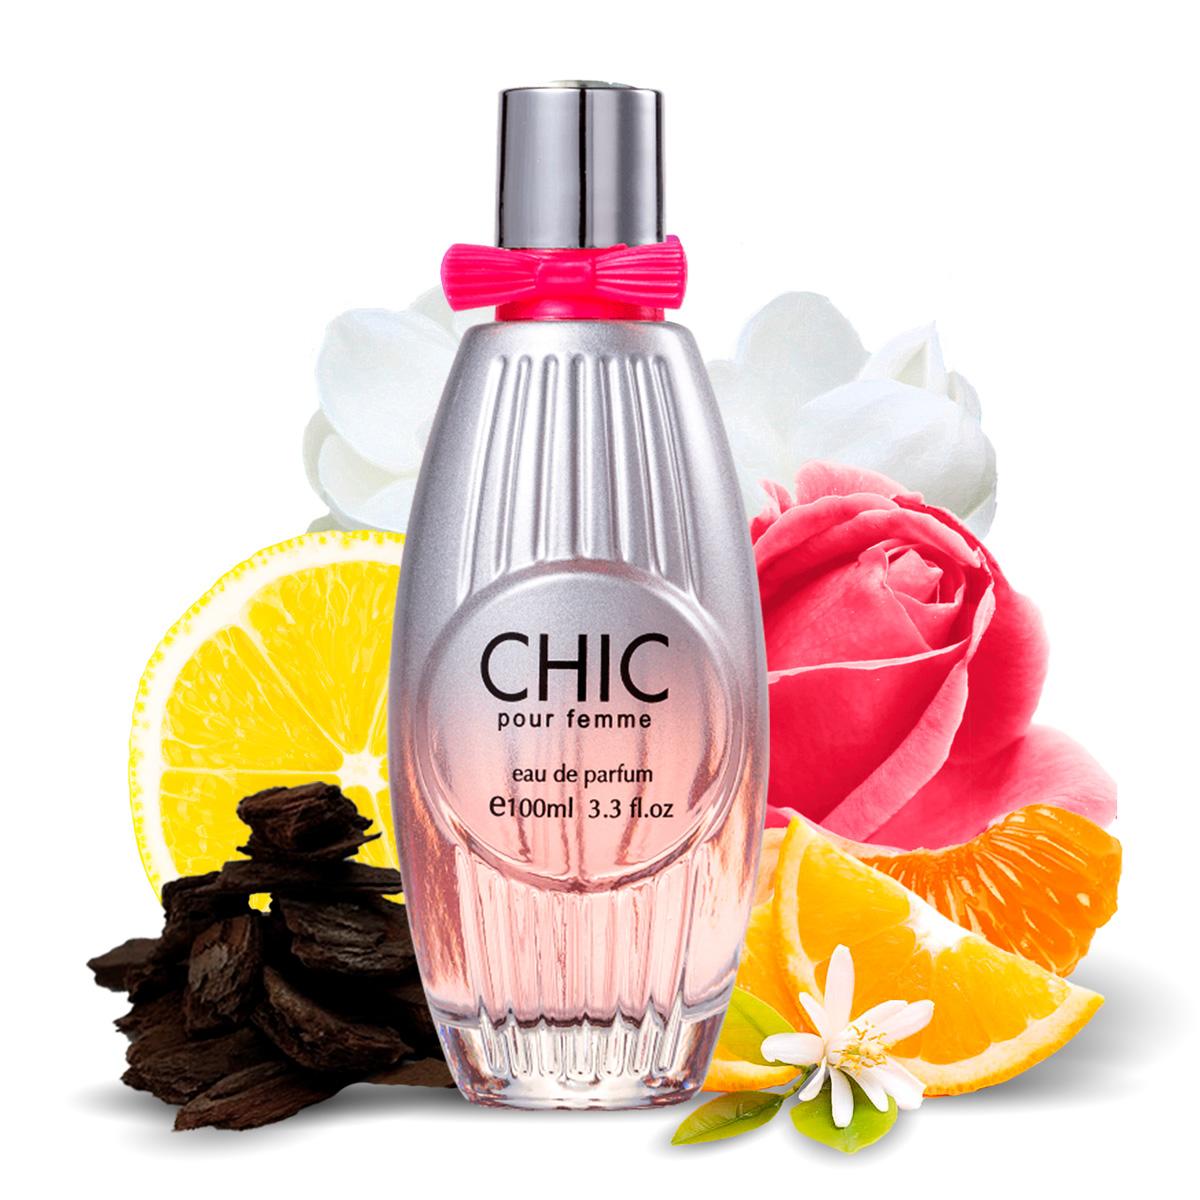 Kit 2 Perfumes Importados Chic e Ebon I Scents